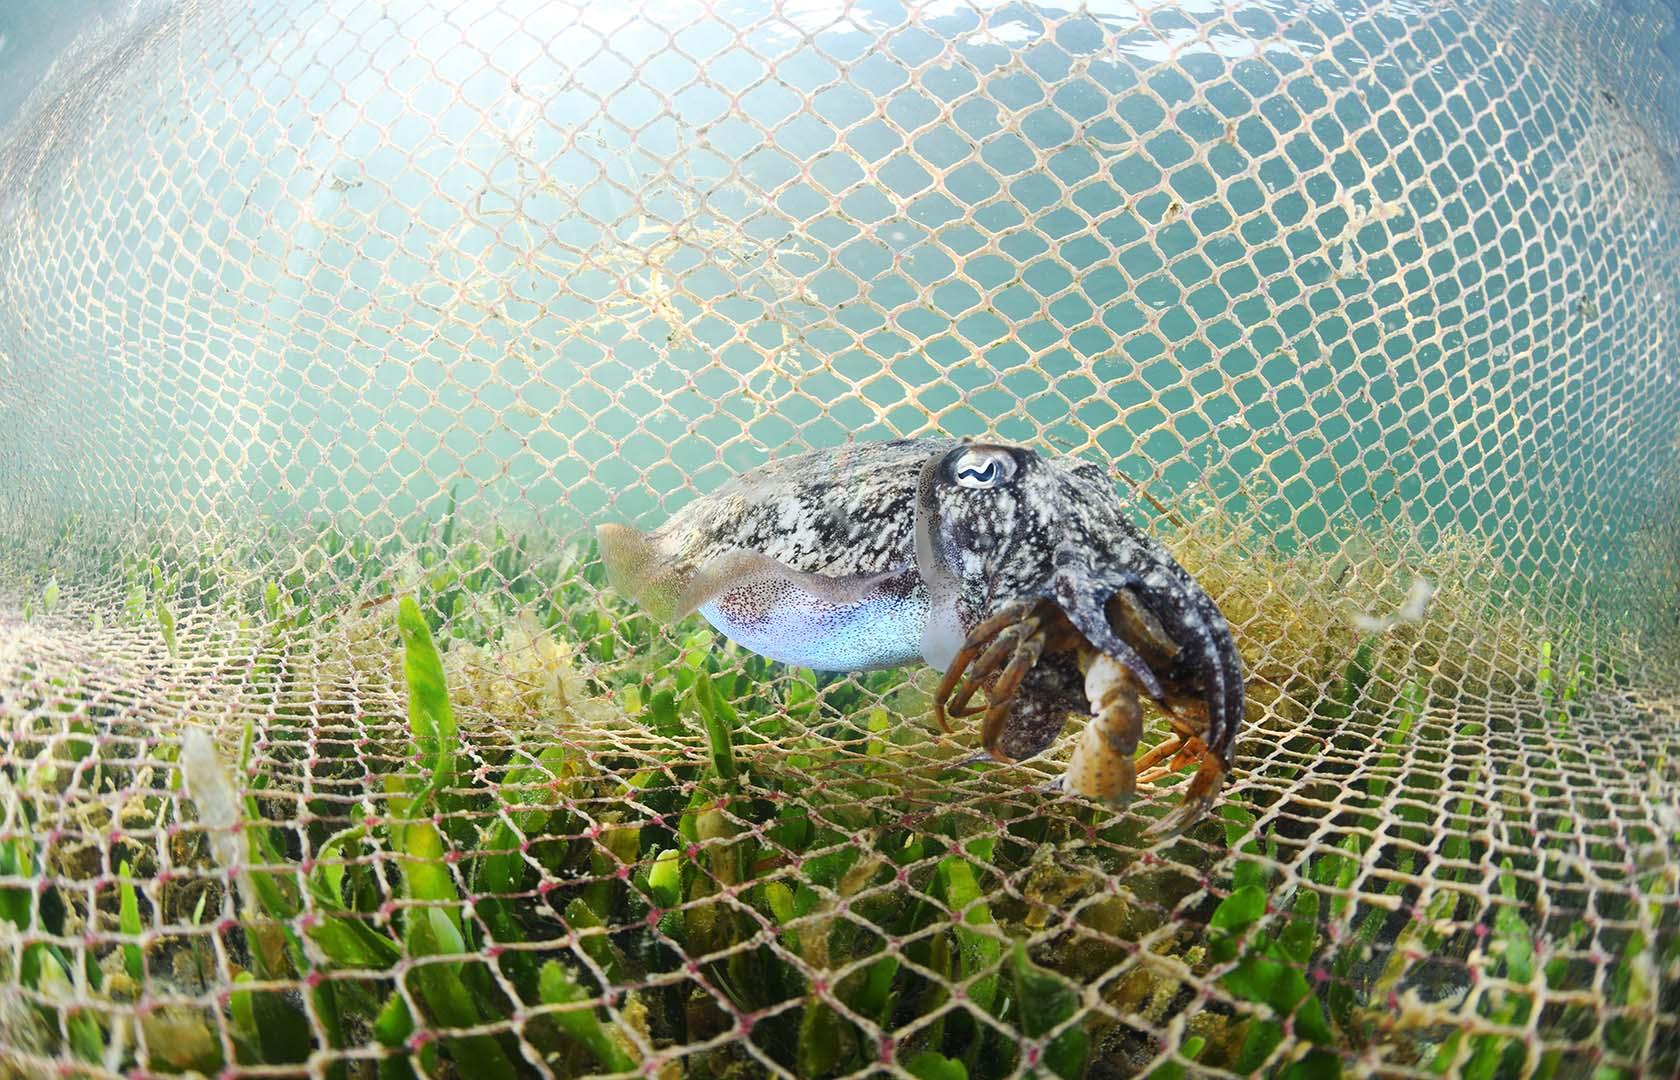 Adulto devorando un cangrejo Carcinus aestuarii.